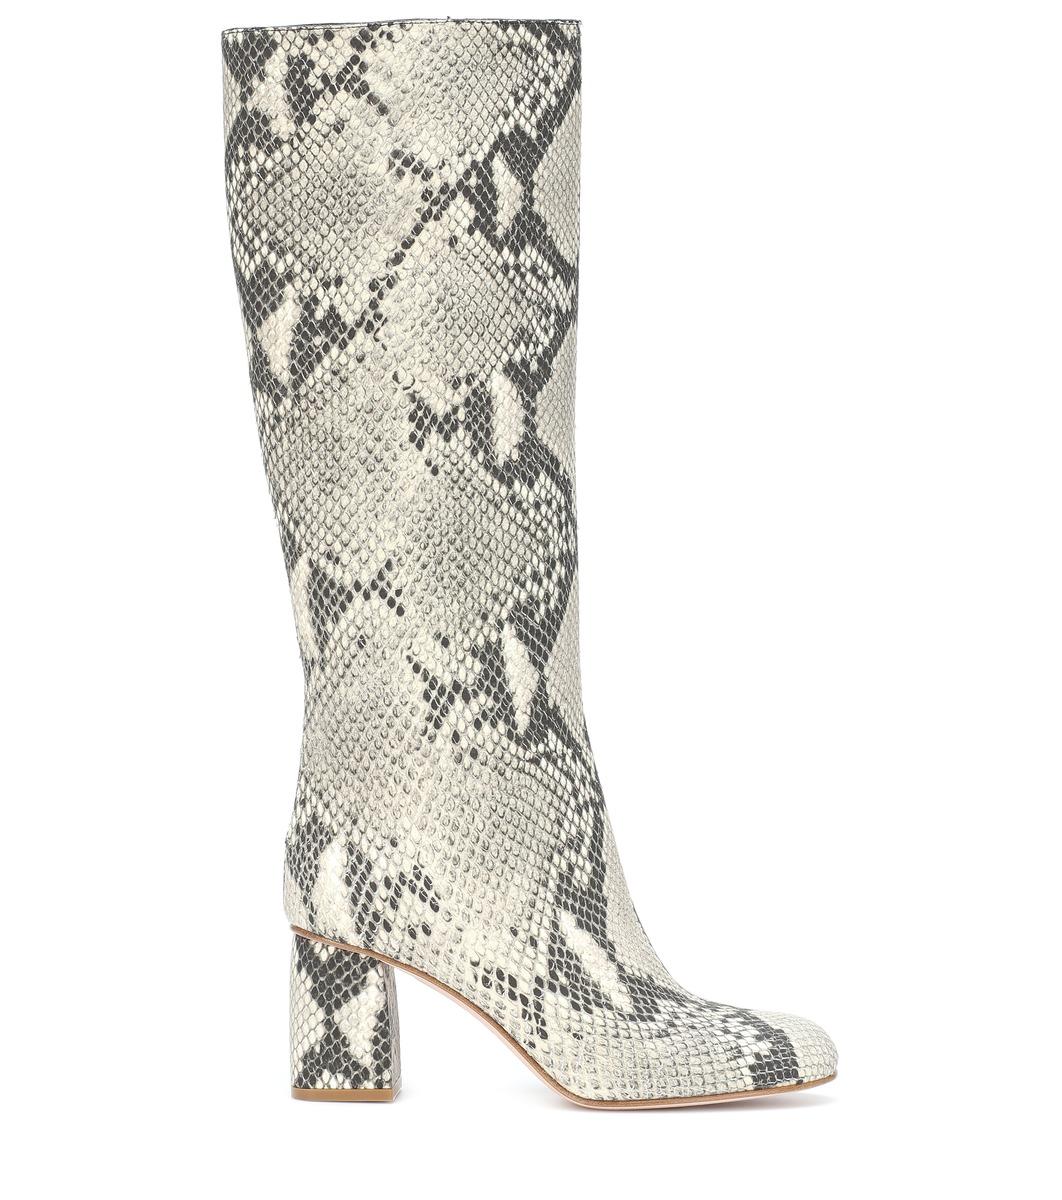 RED (V) snake-effect knee high boots